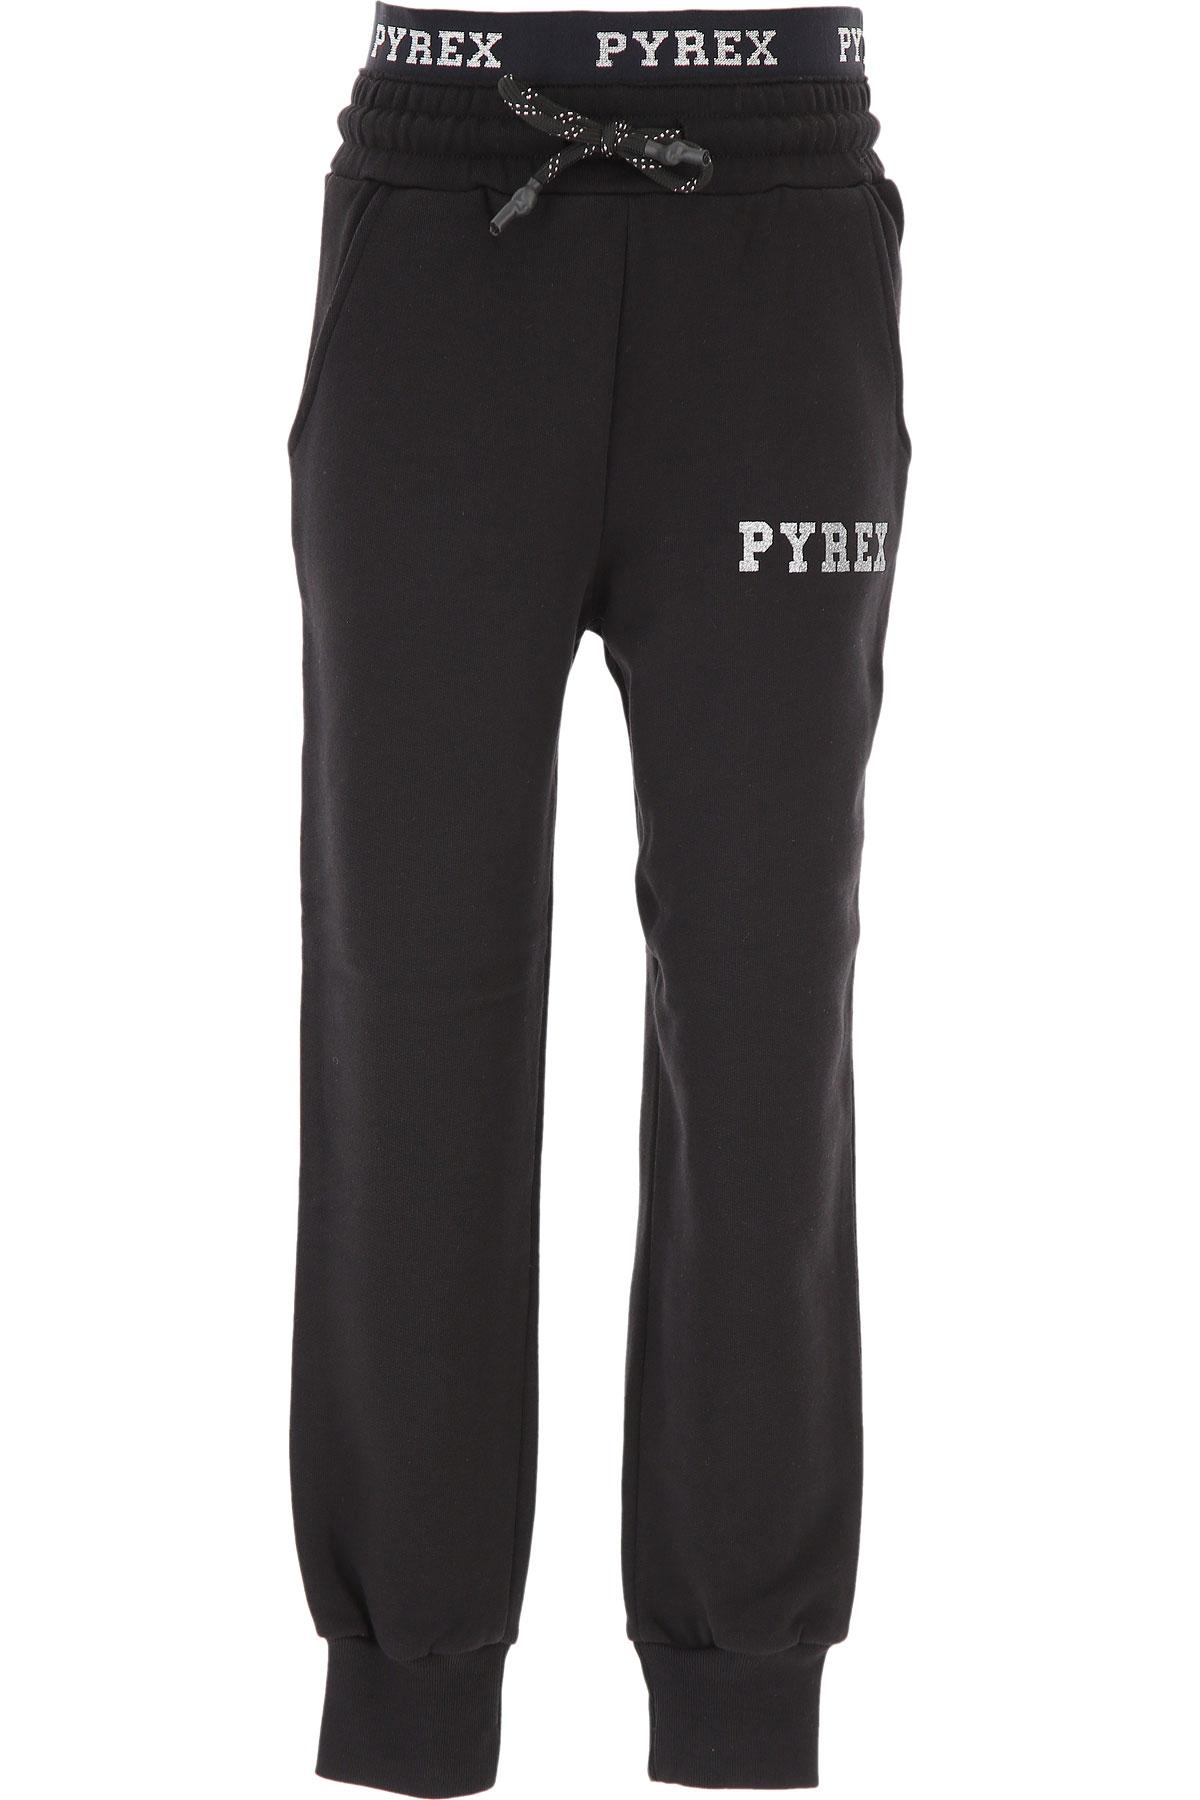 Pyrex Kids Sweatpants for Girls On Sale, Black, Cotton, 2019, S XXL